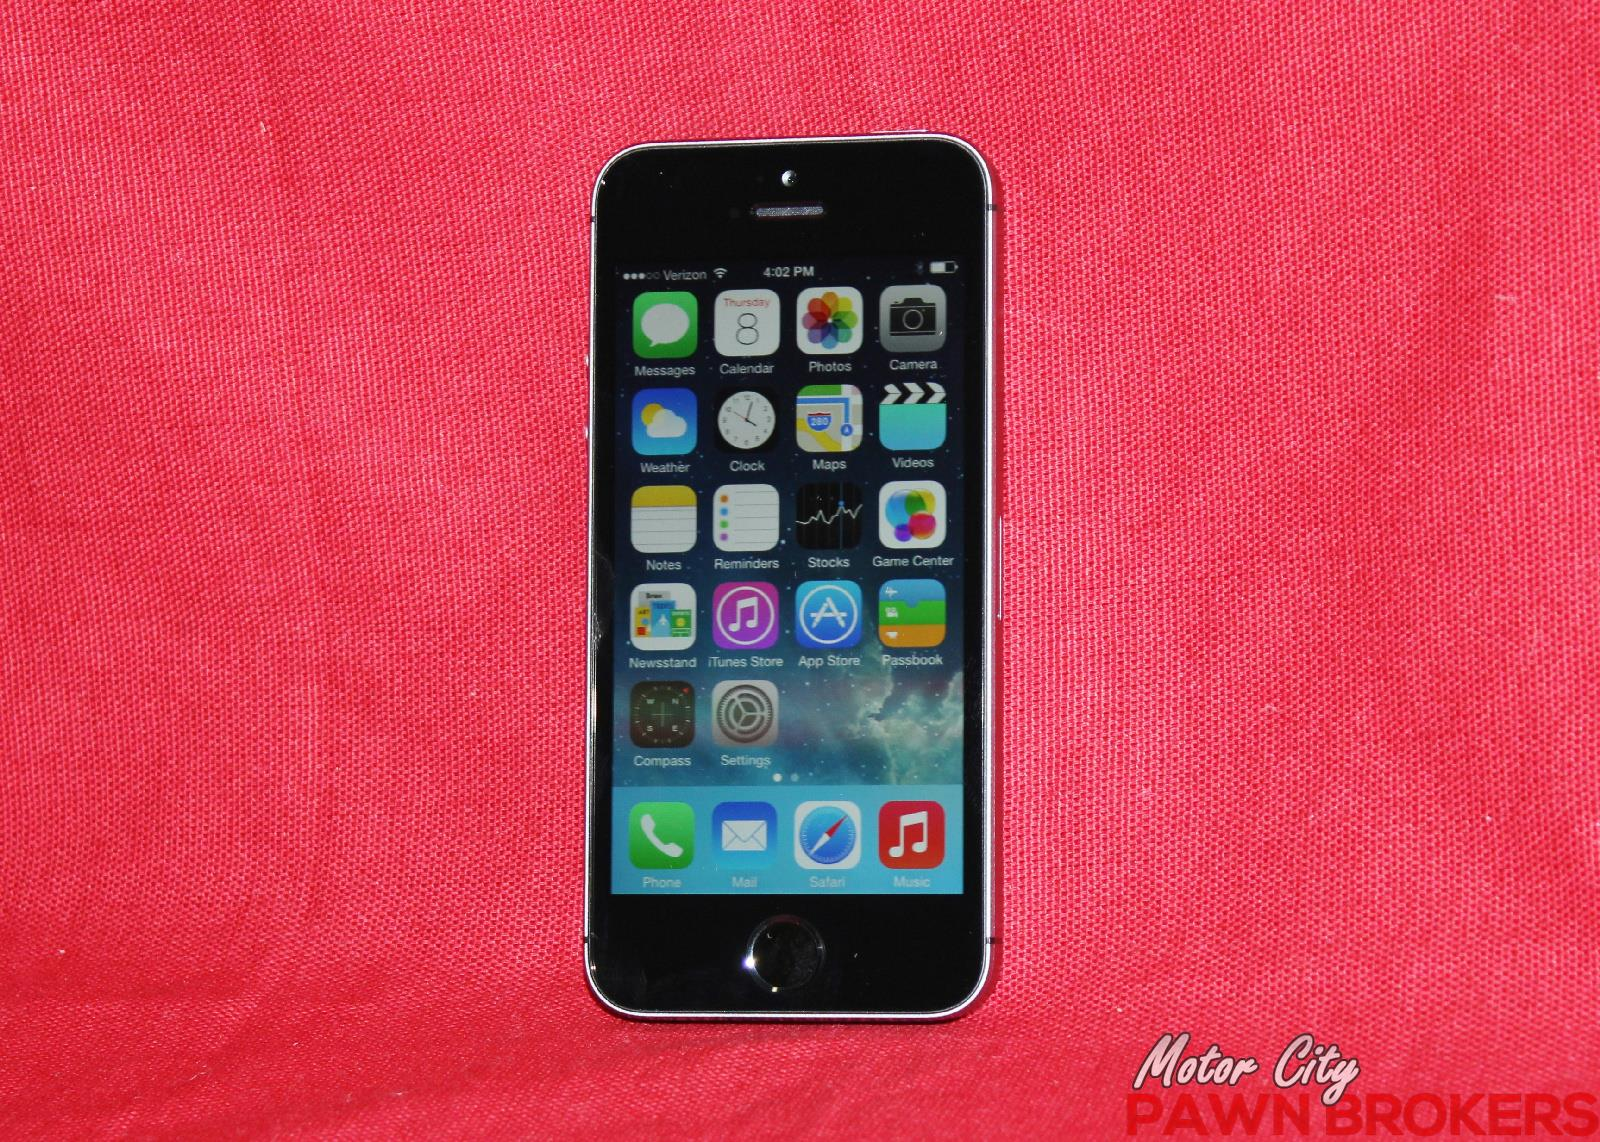 apple iphone 5s me341ll a 16gb space gray verizon. Black Bedroom Furniture Sets. Home Design Ideas